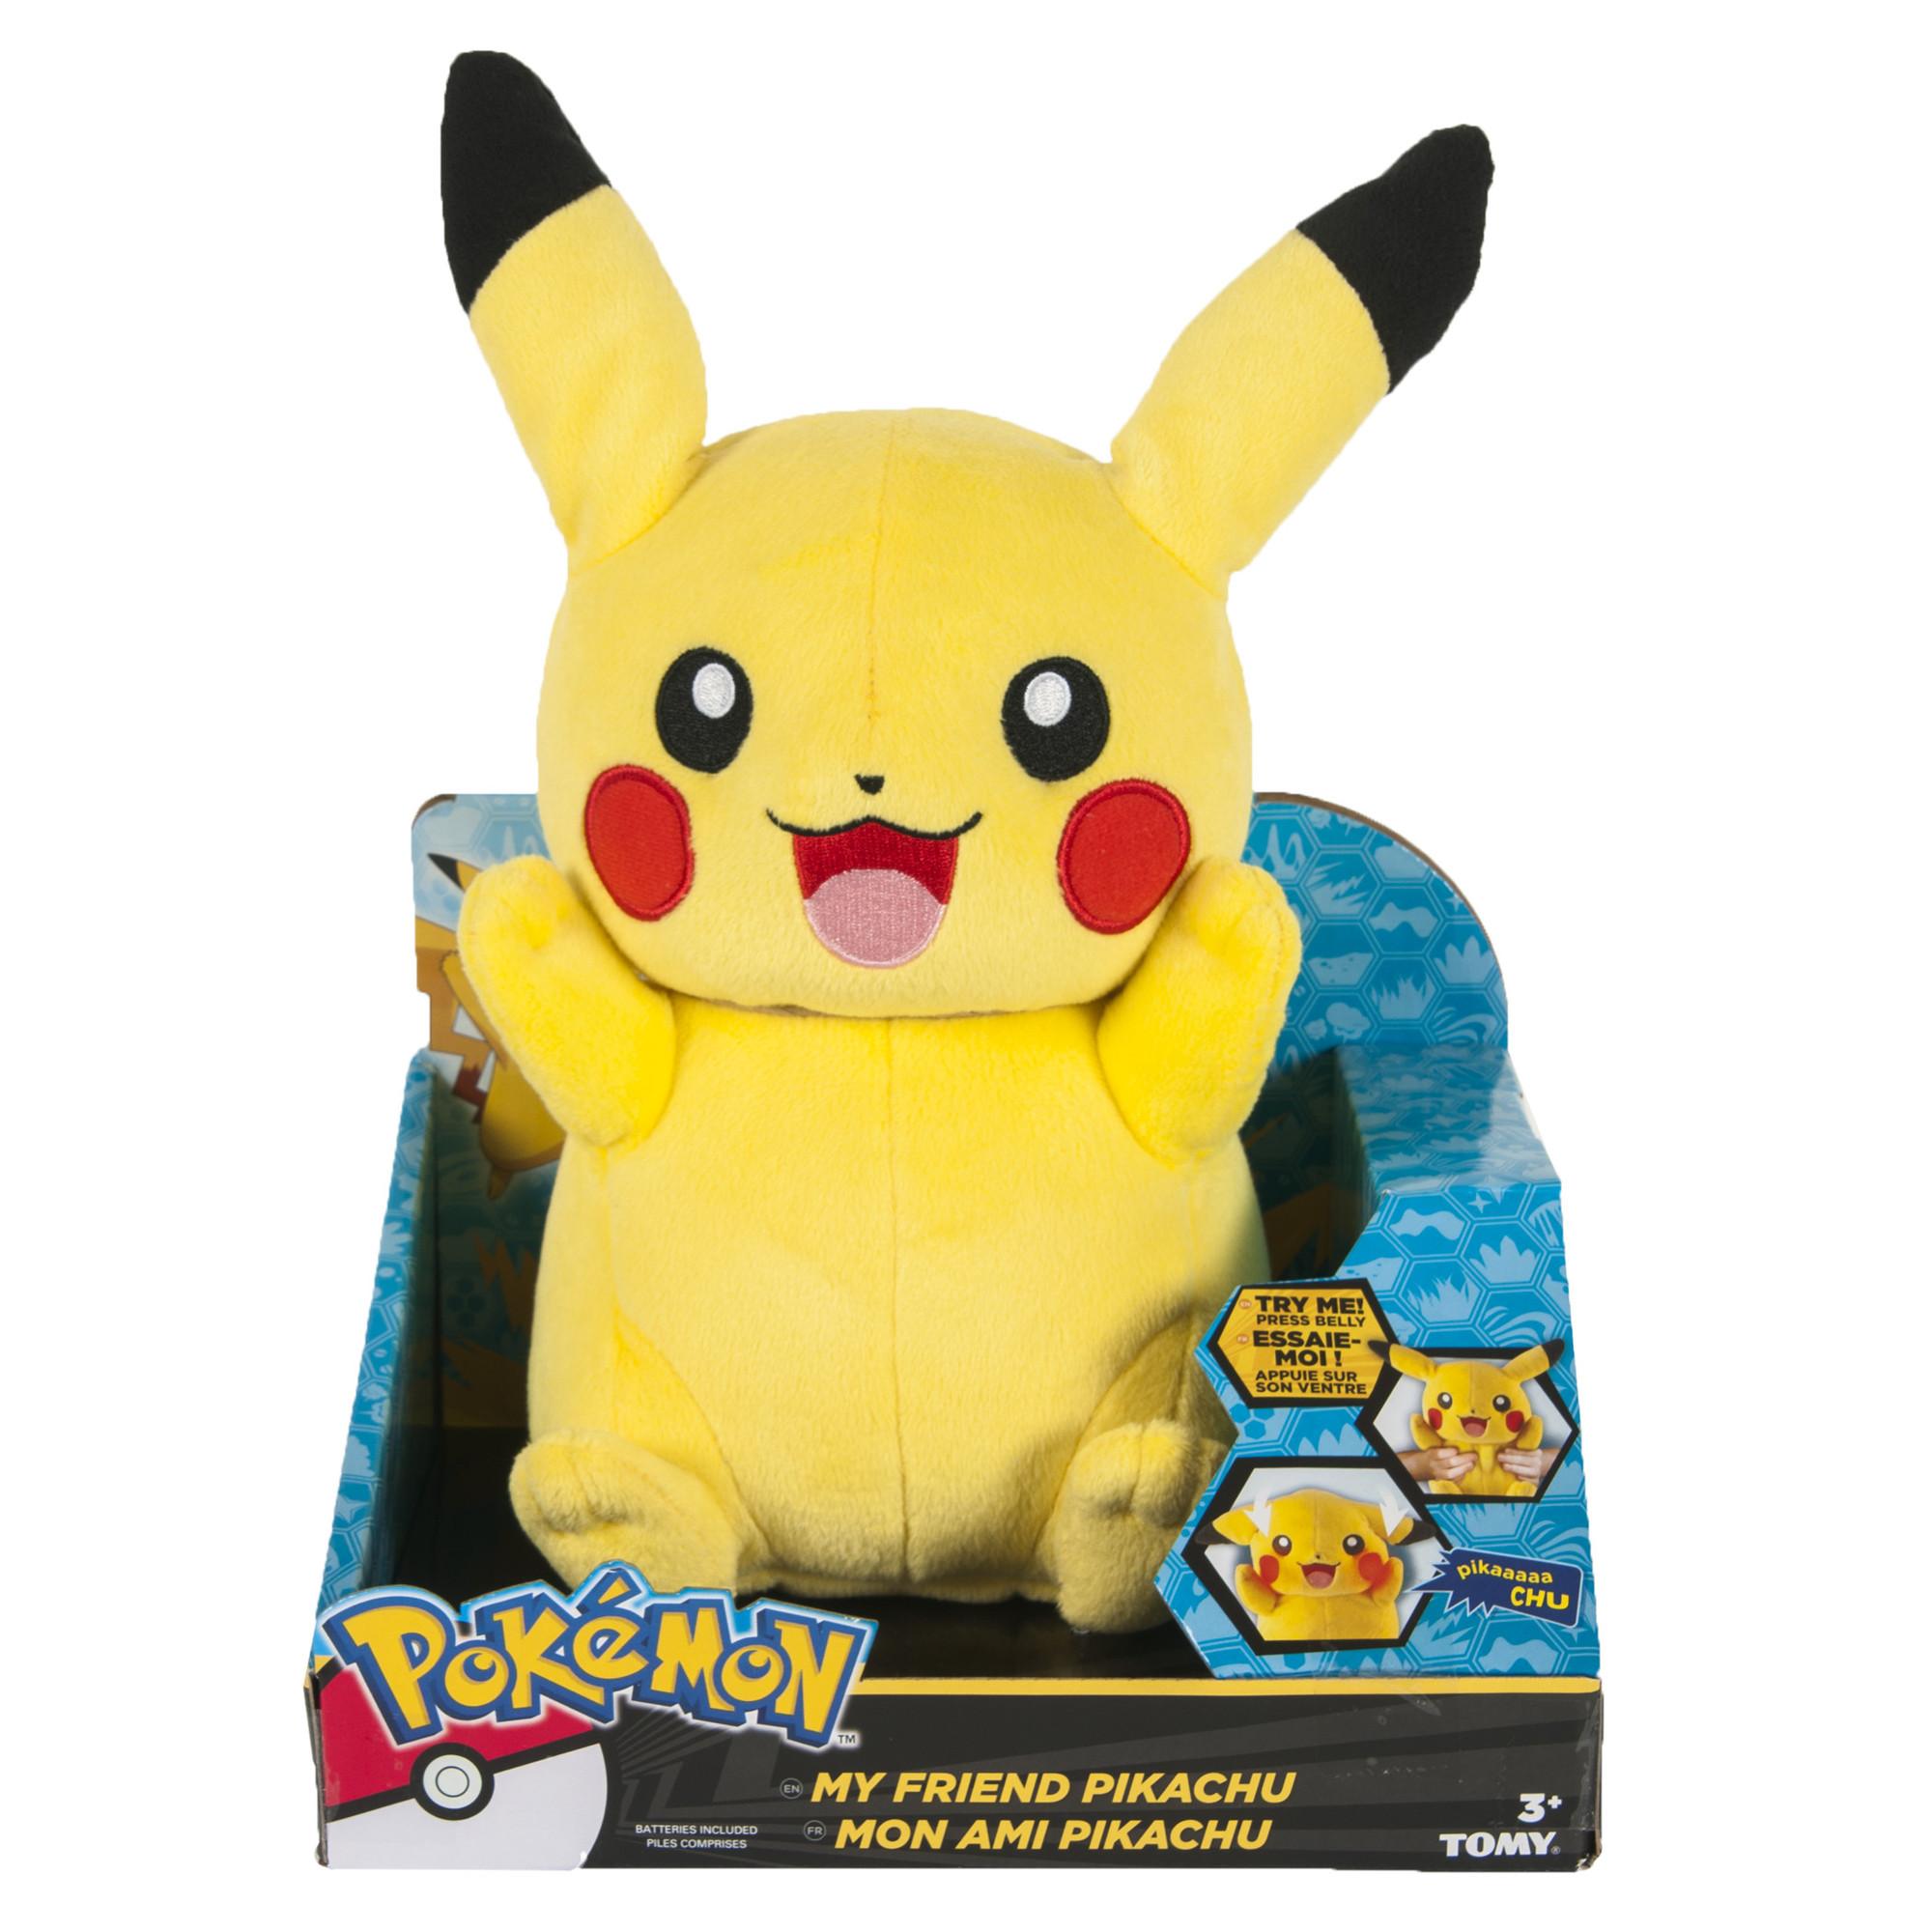 TAKARATOMY Punitto Friend Unwind Time Pokemon Pikachu Moving toys